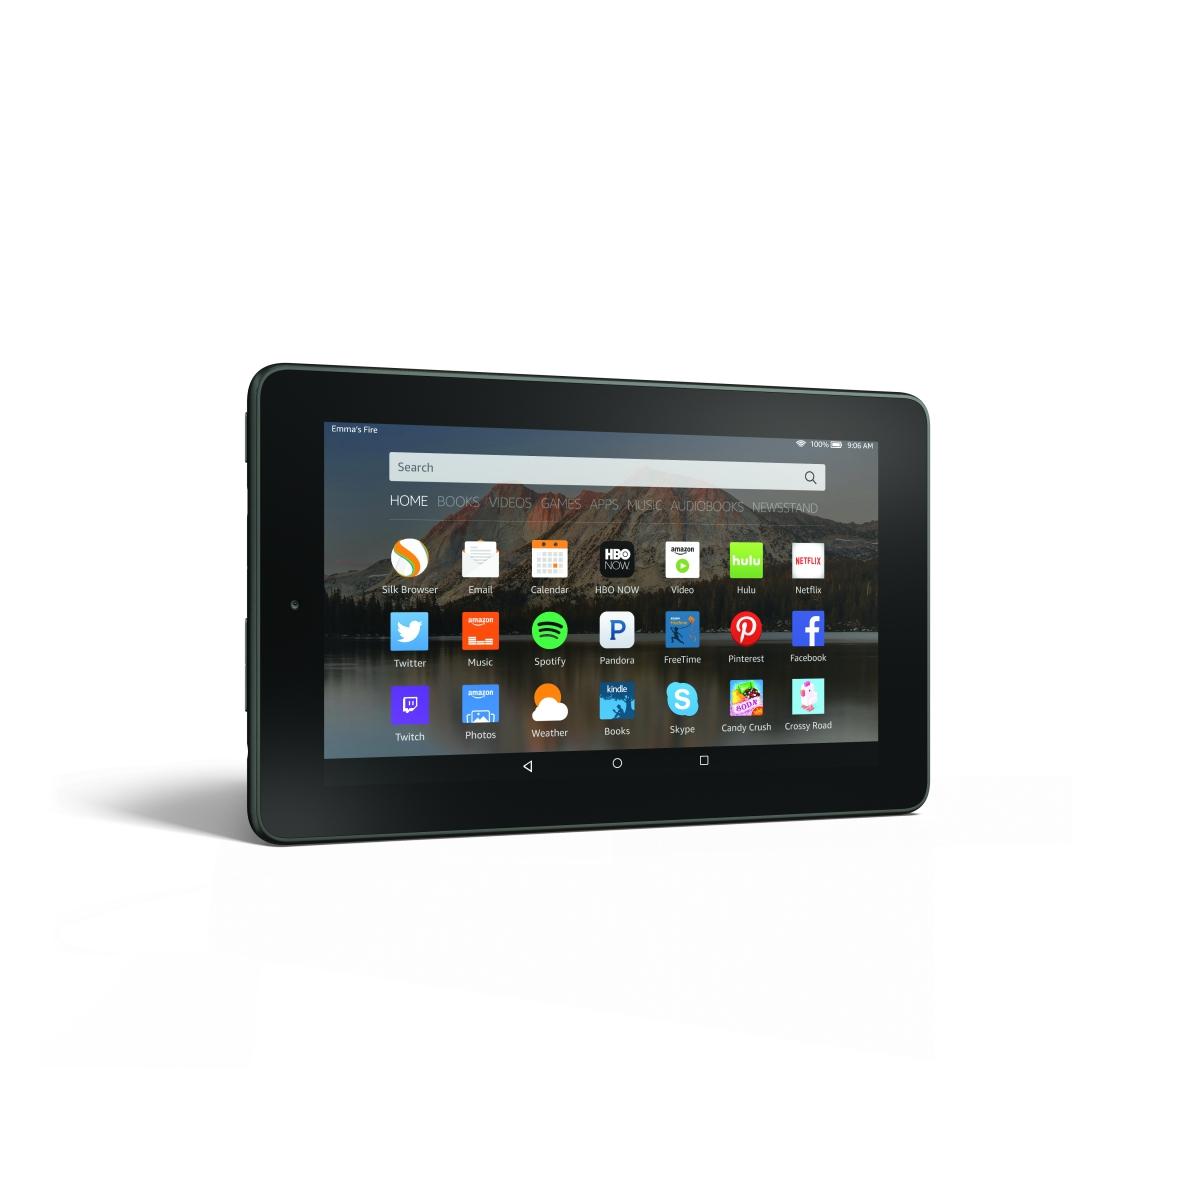 Amazon Fire 7 tablet horizontal